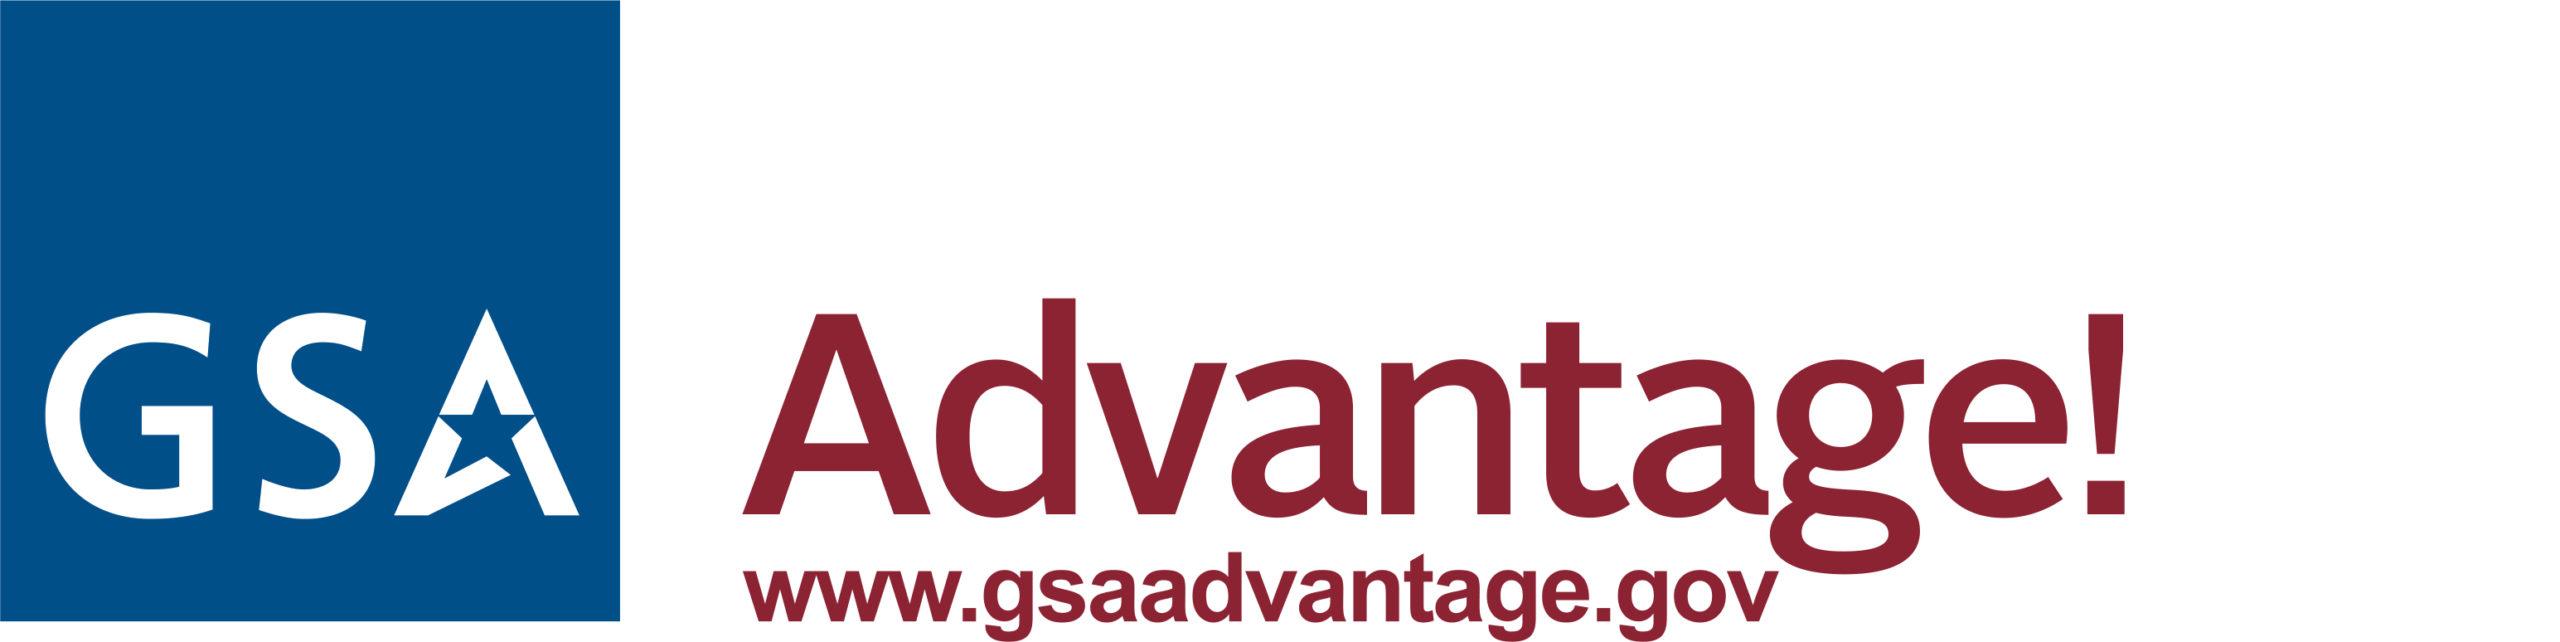 GSA-advantage-artwork